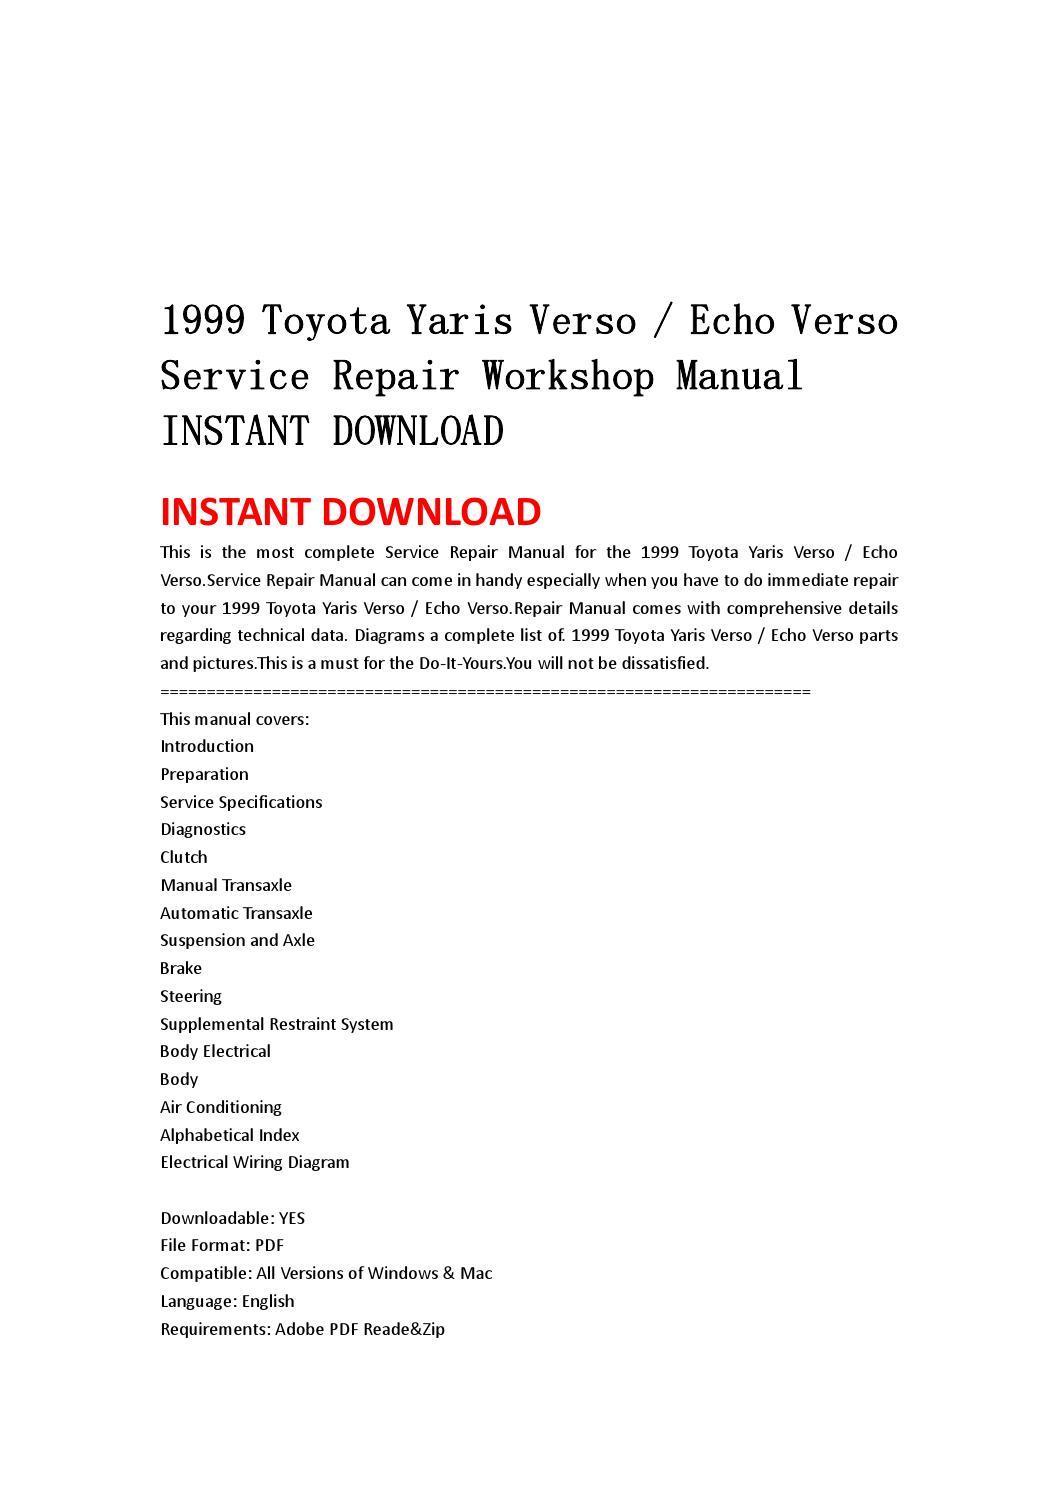 1999 2005 Toyota Yaris Verso Echo Verso Service Repair